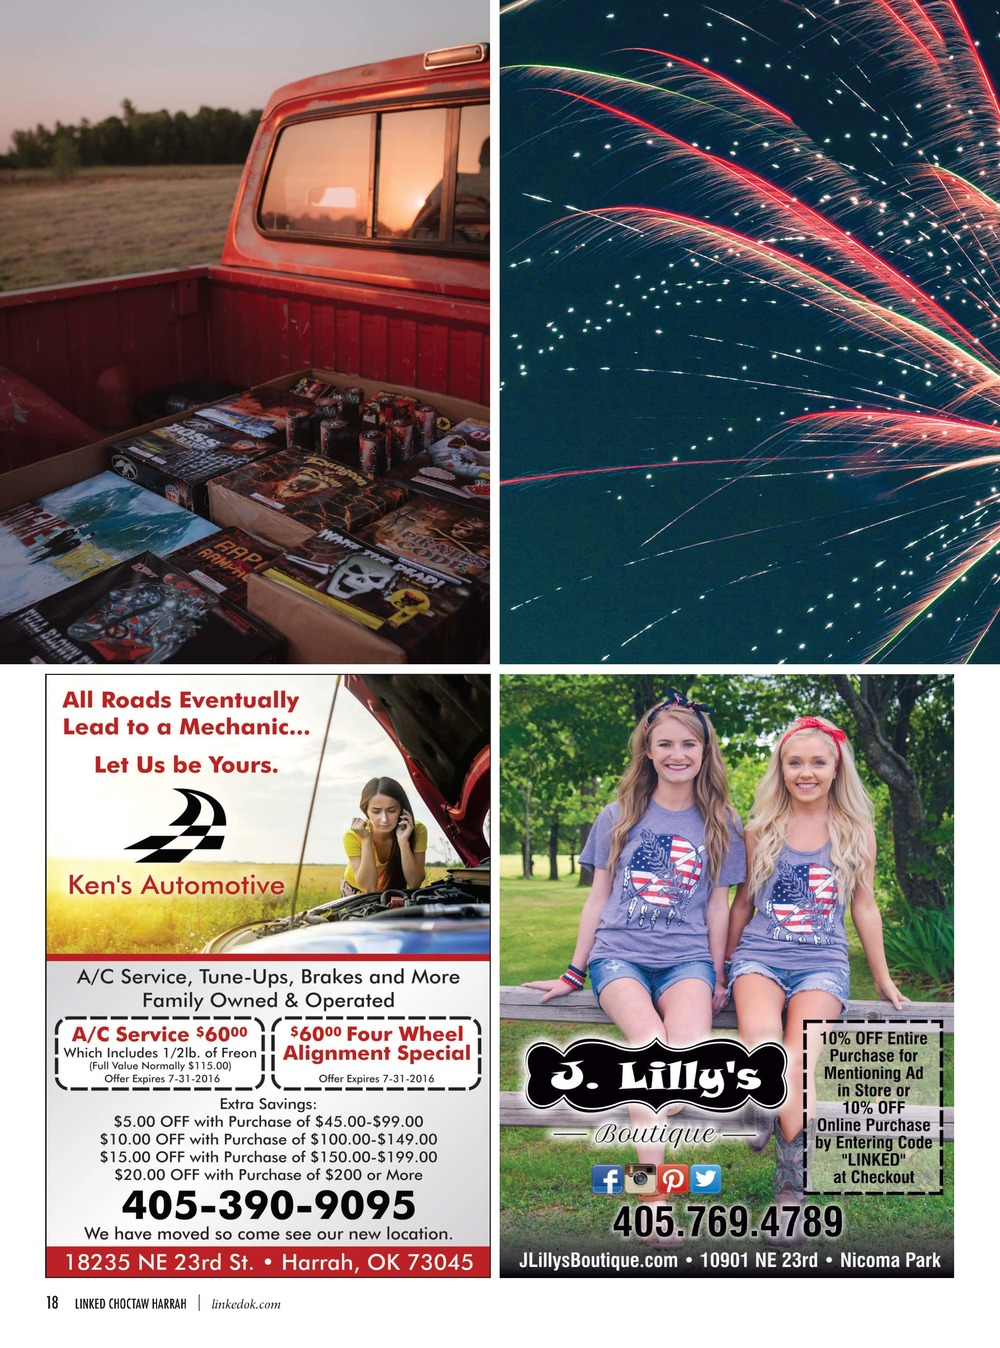 HighFive_ChoctawHarrah_June 2016 REVISED_Page_18.jpg